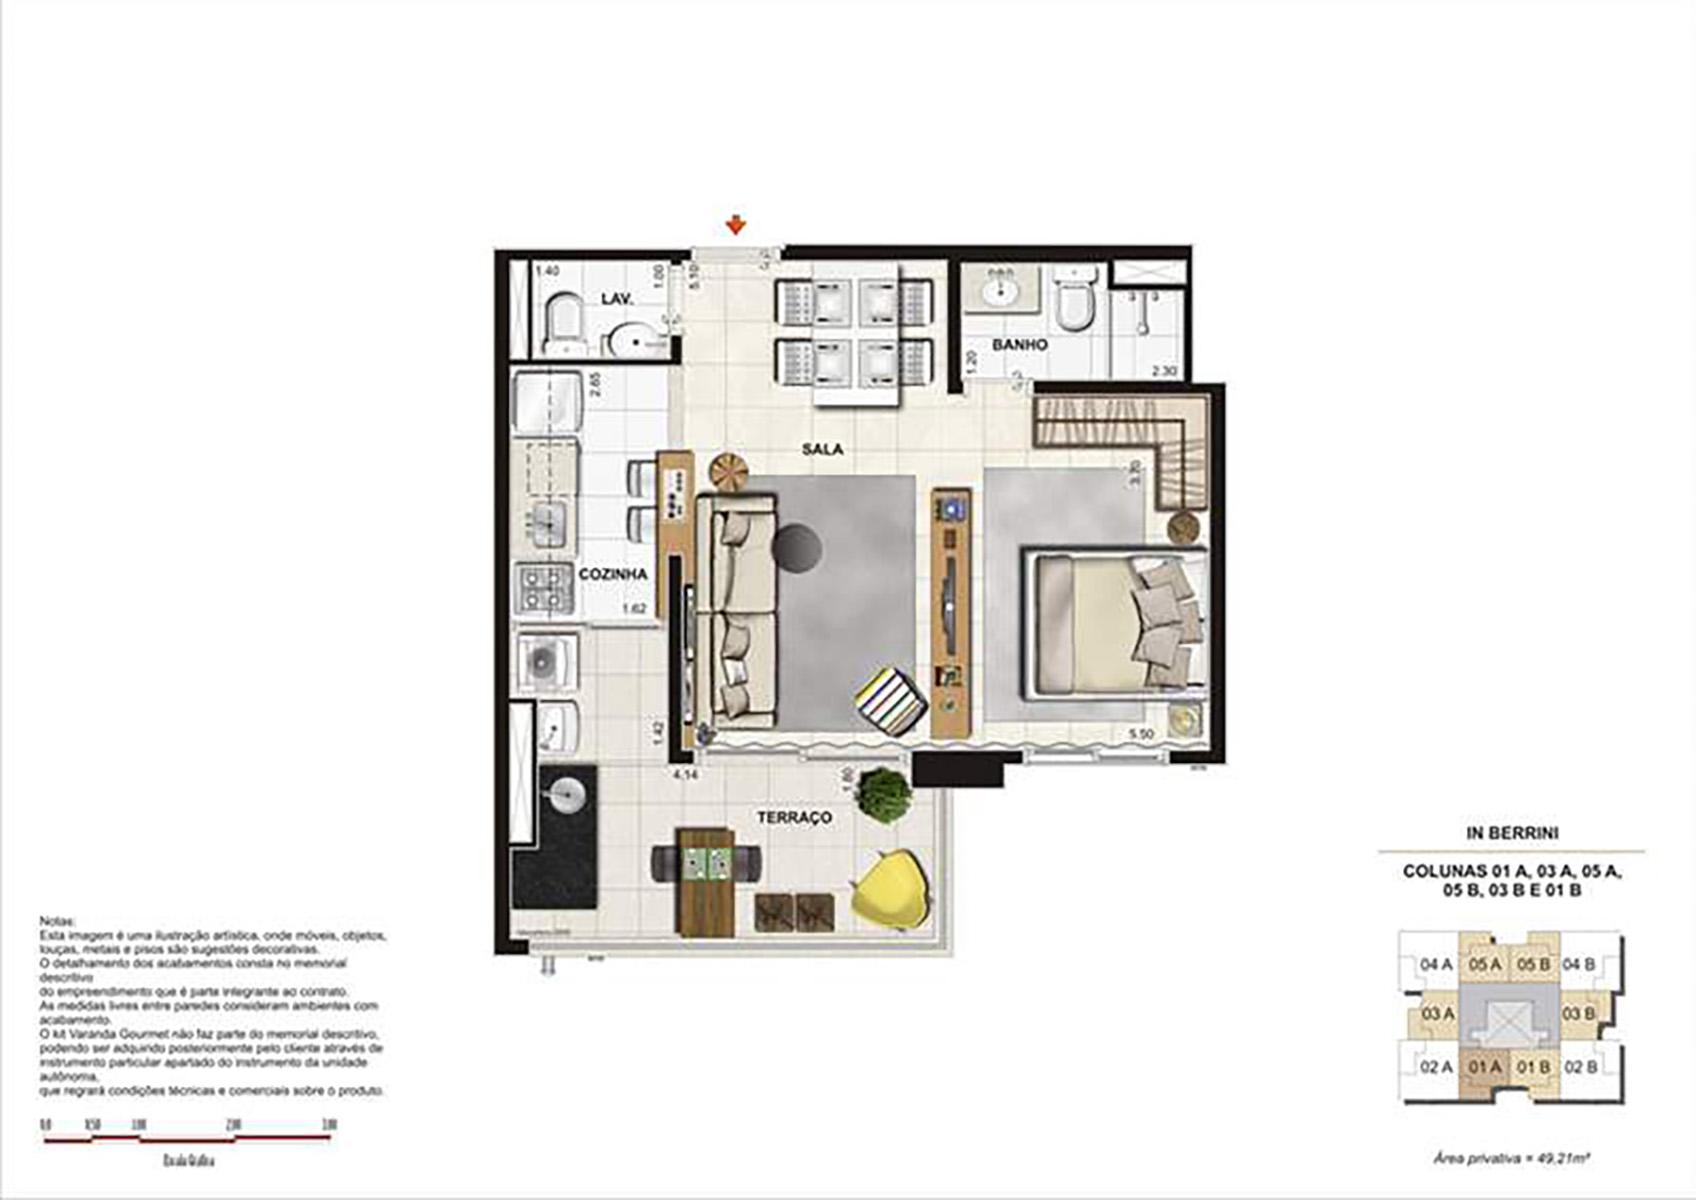 Ilustração Artística da Planta Studio 49 m² In Berrini